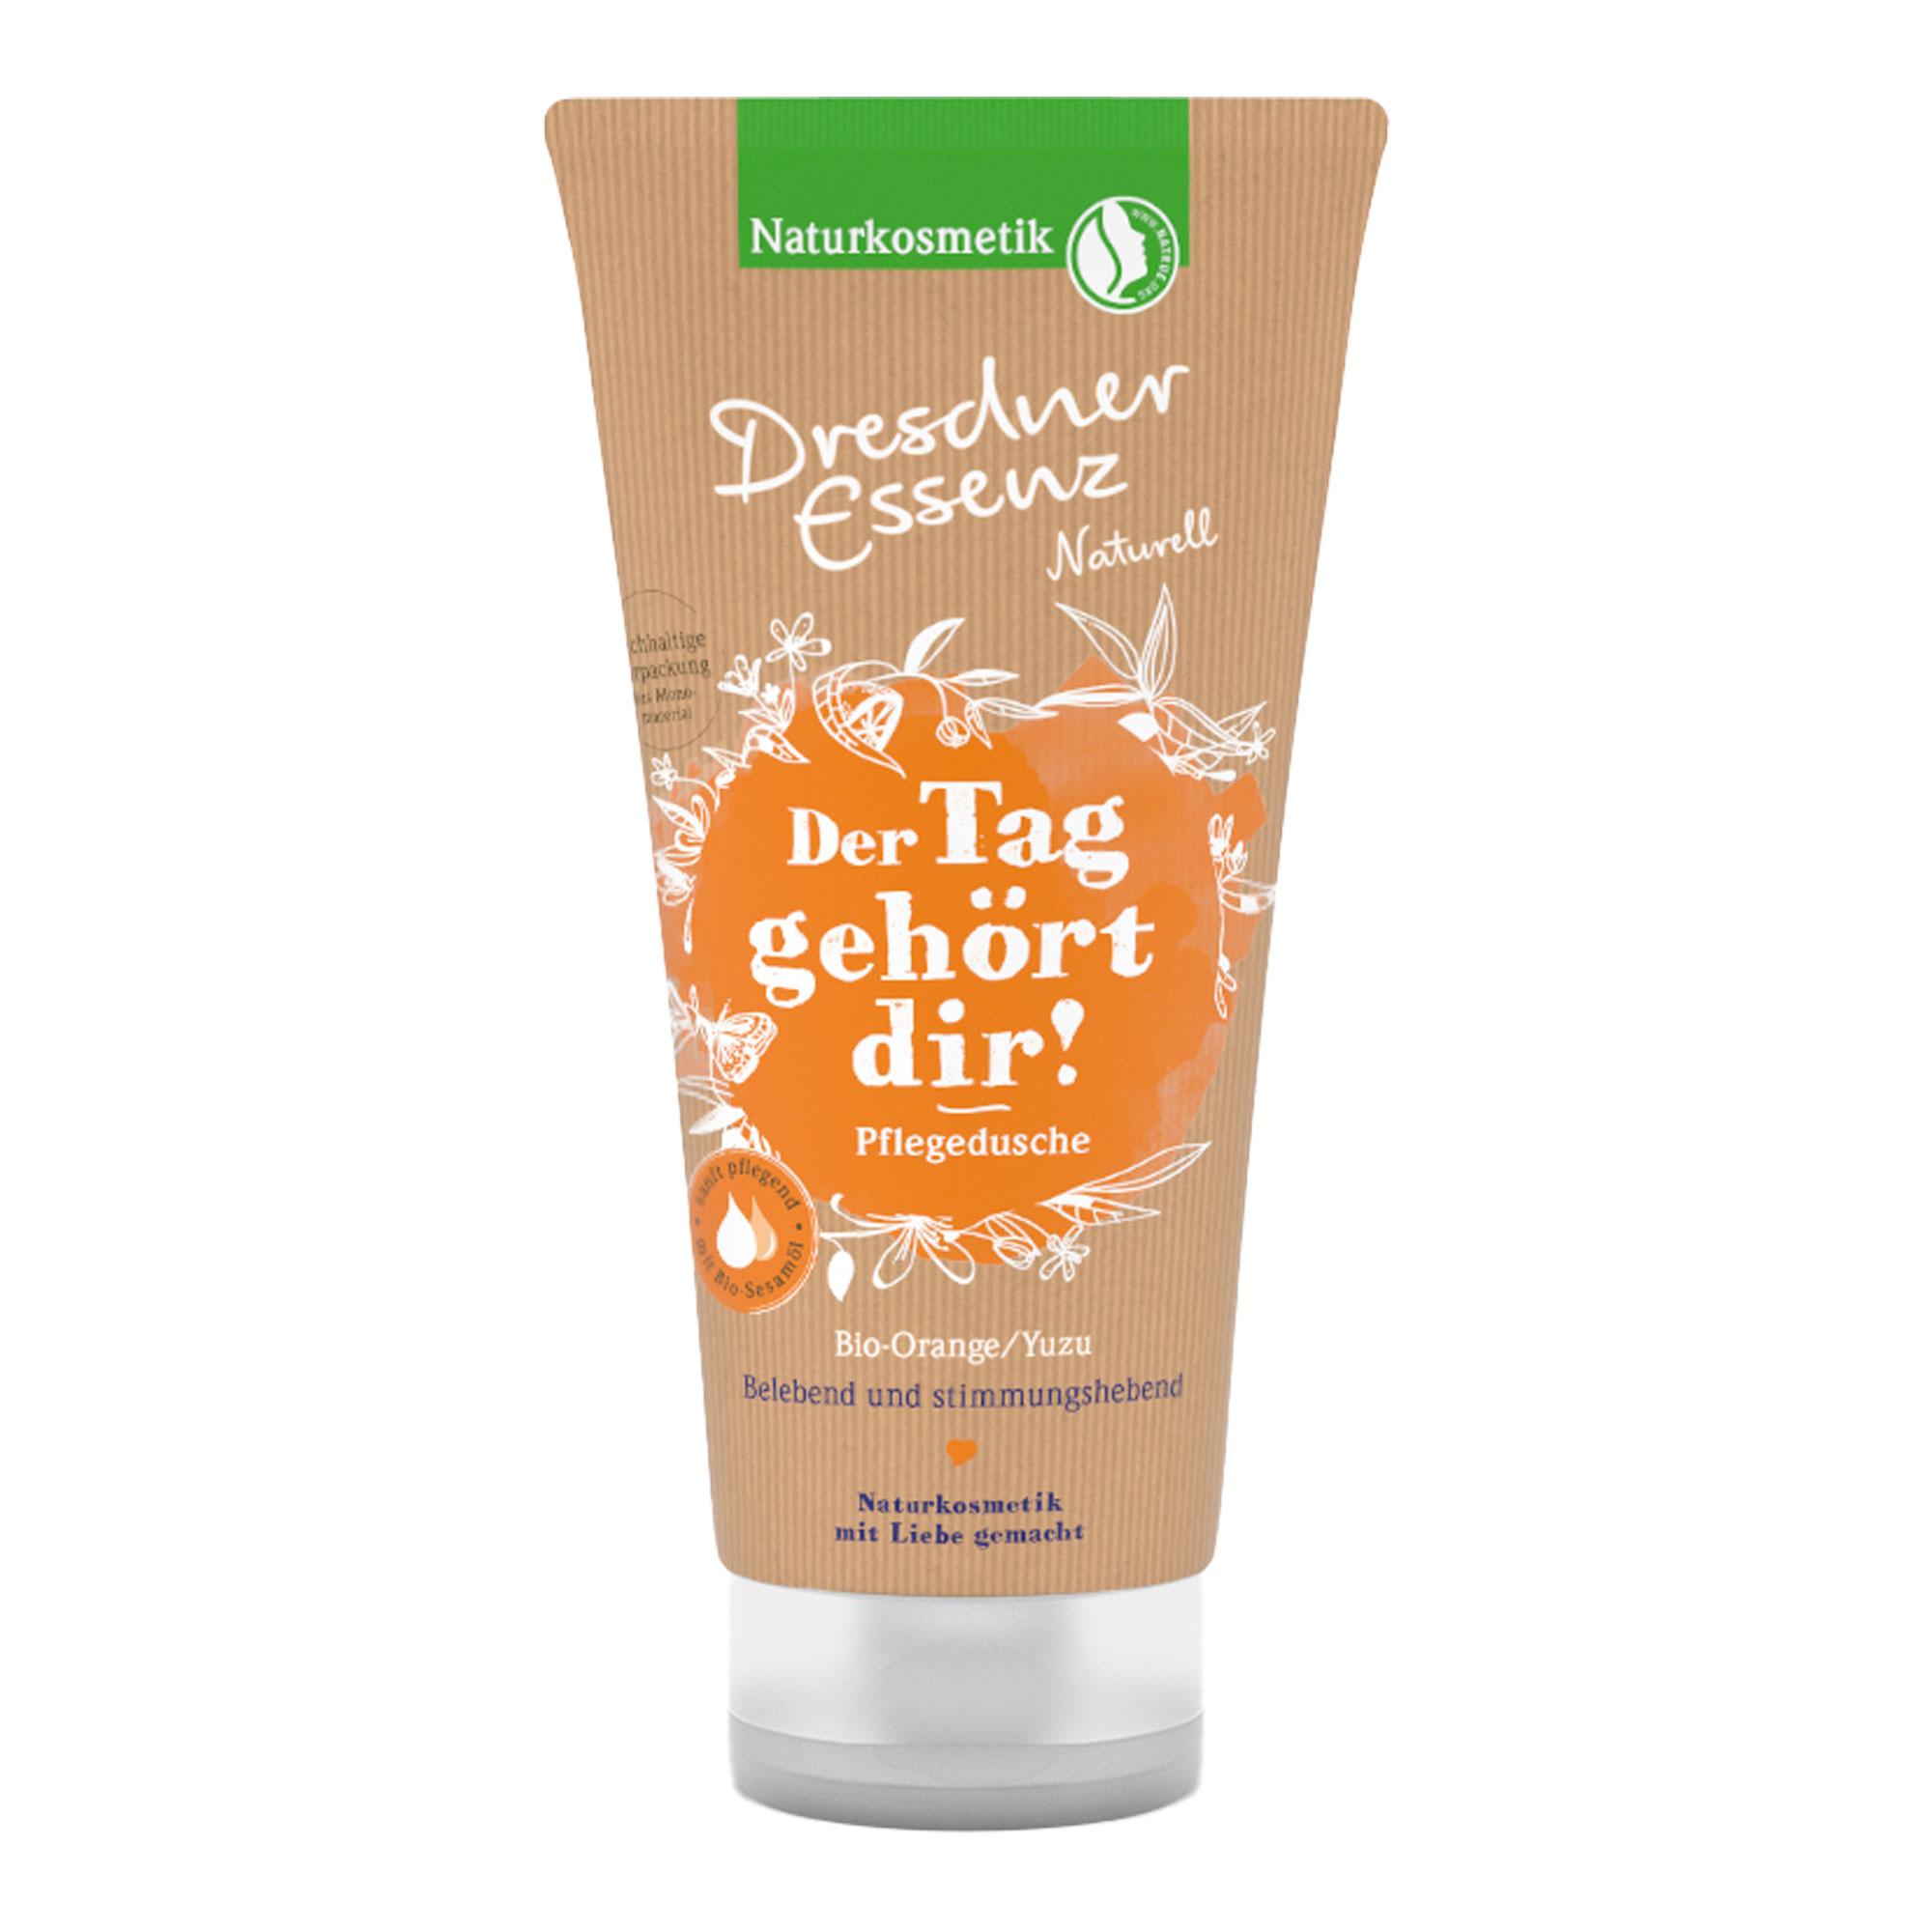 Dresdner Essenz Duschgel Der Tag gehört dir